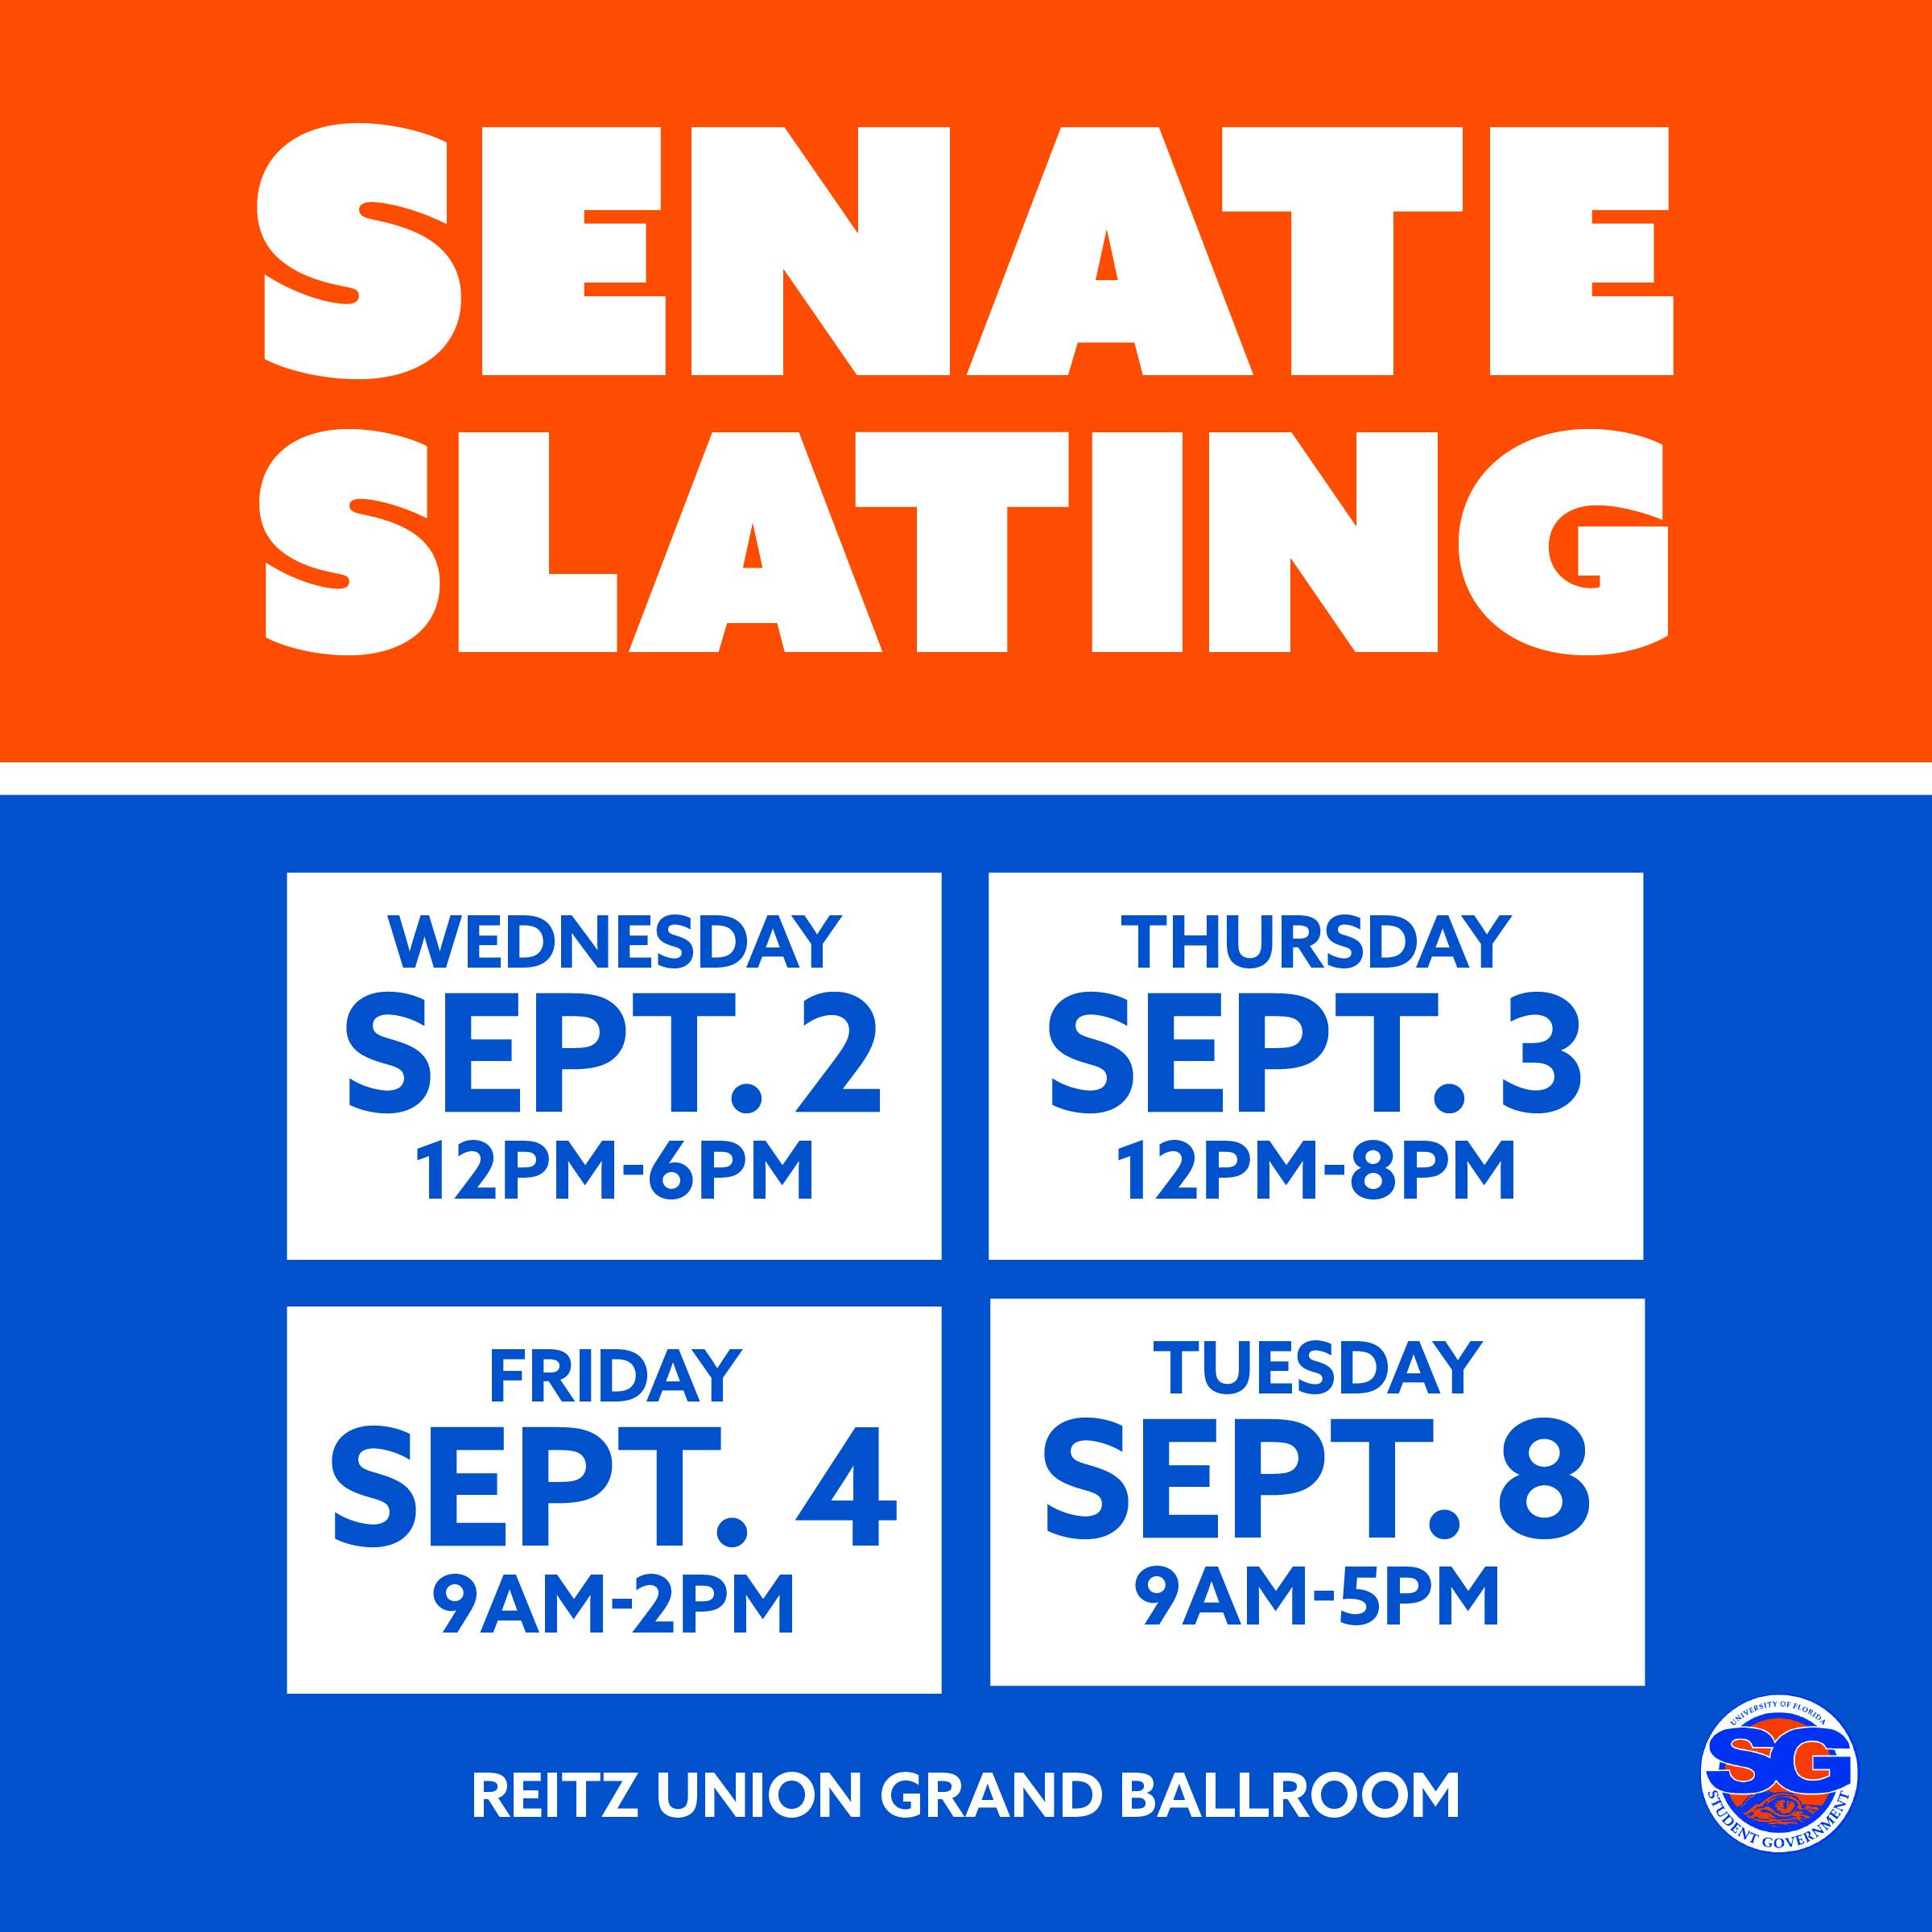 senate slating.jpg